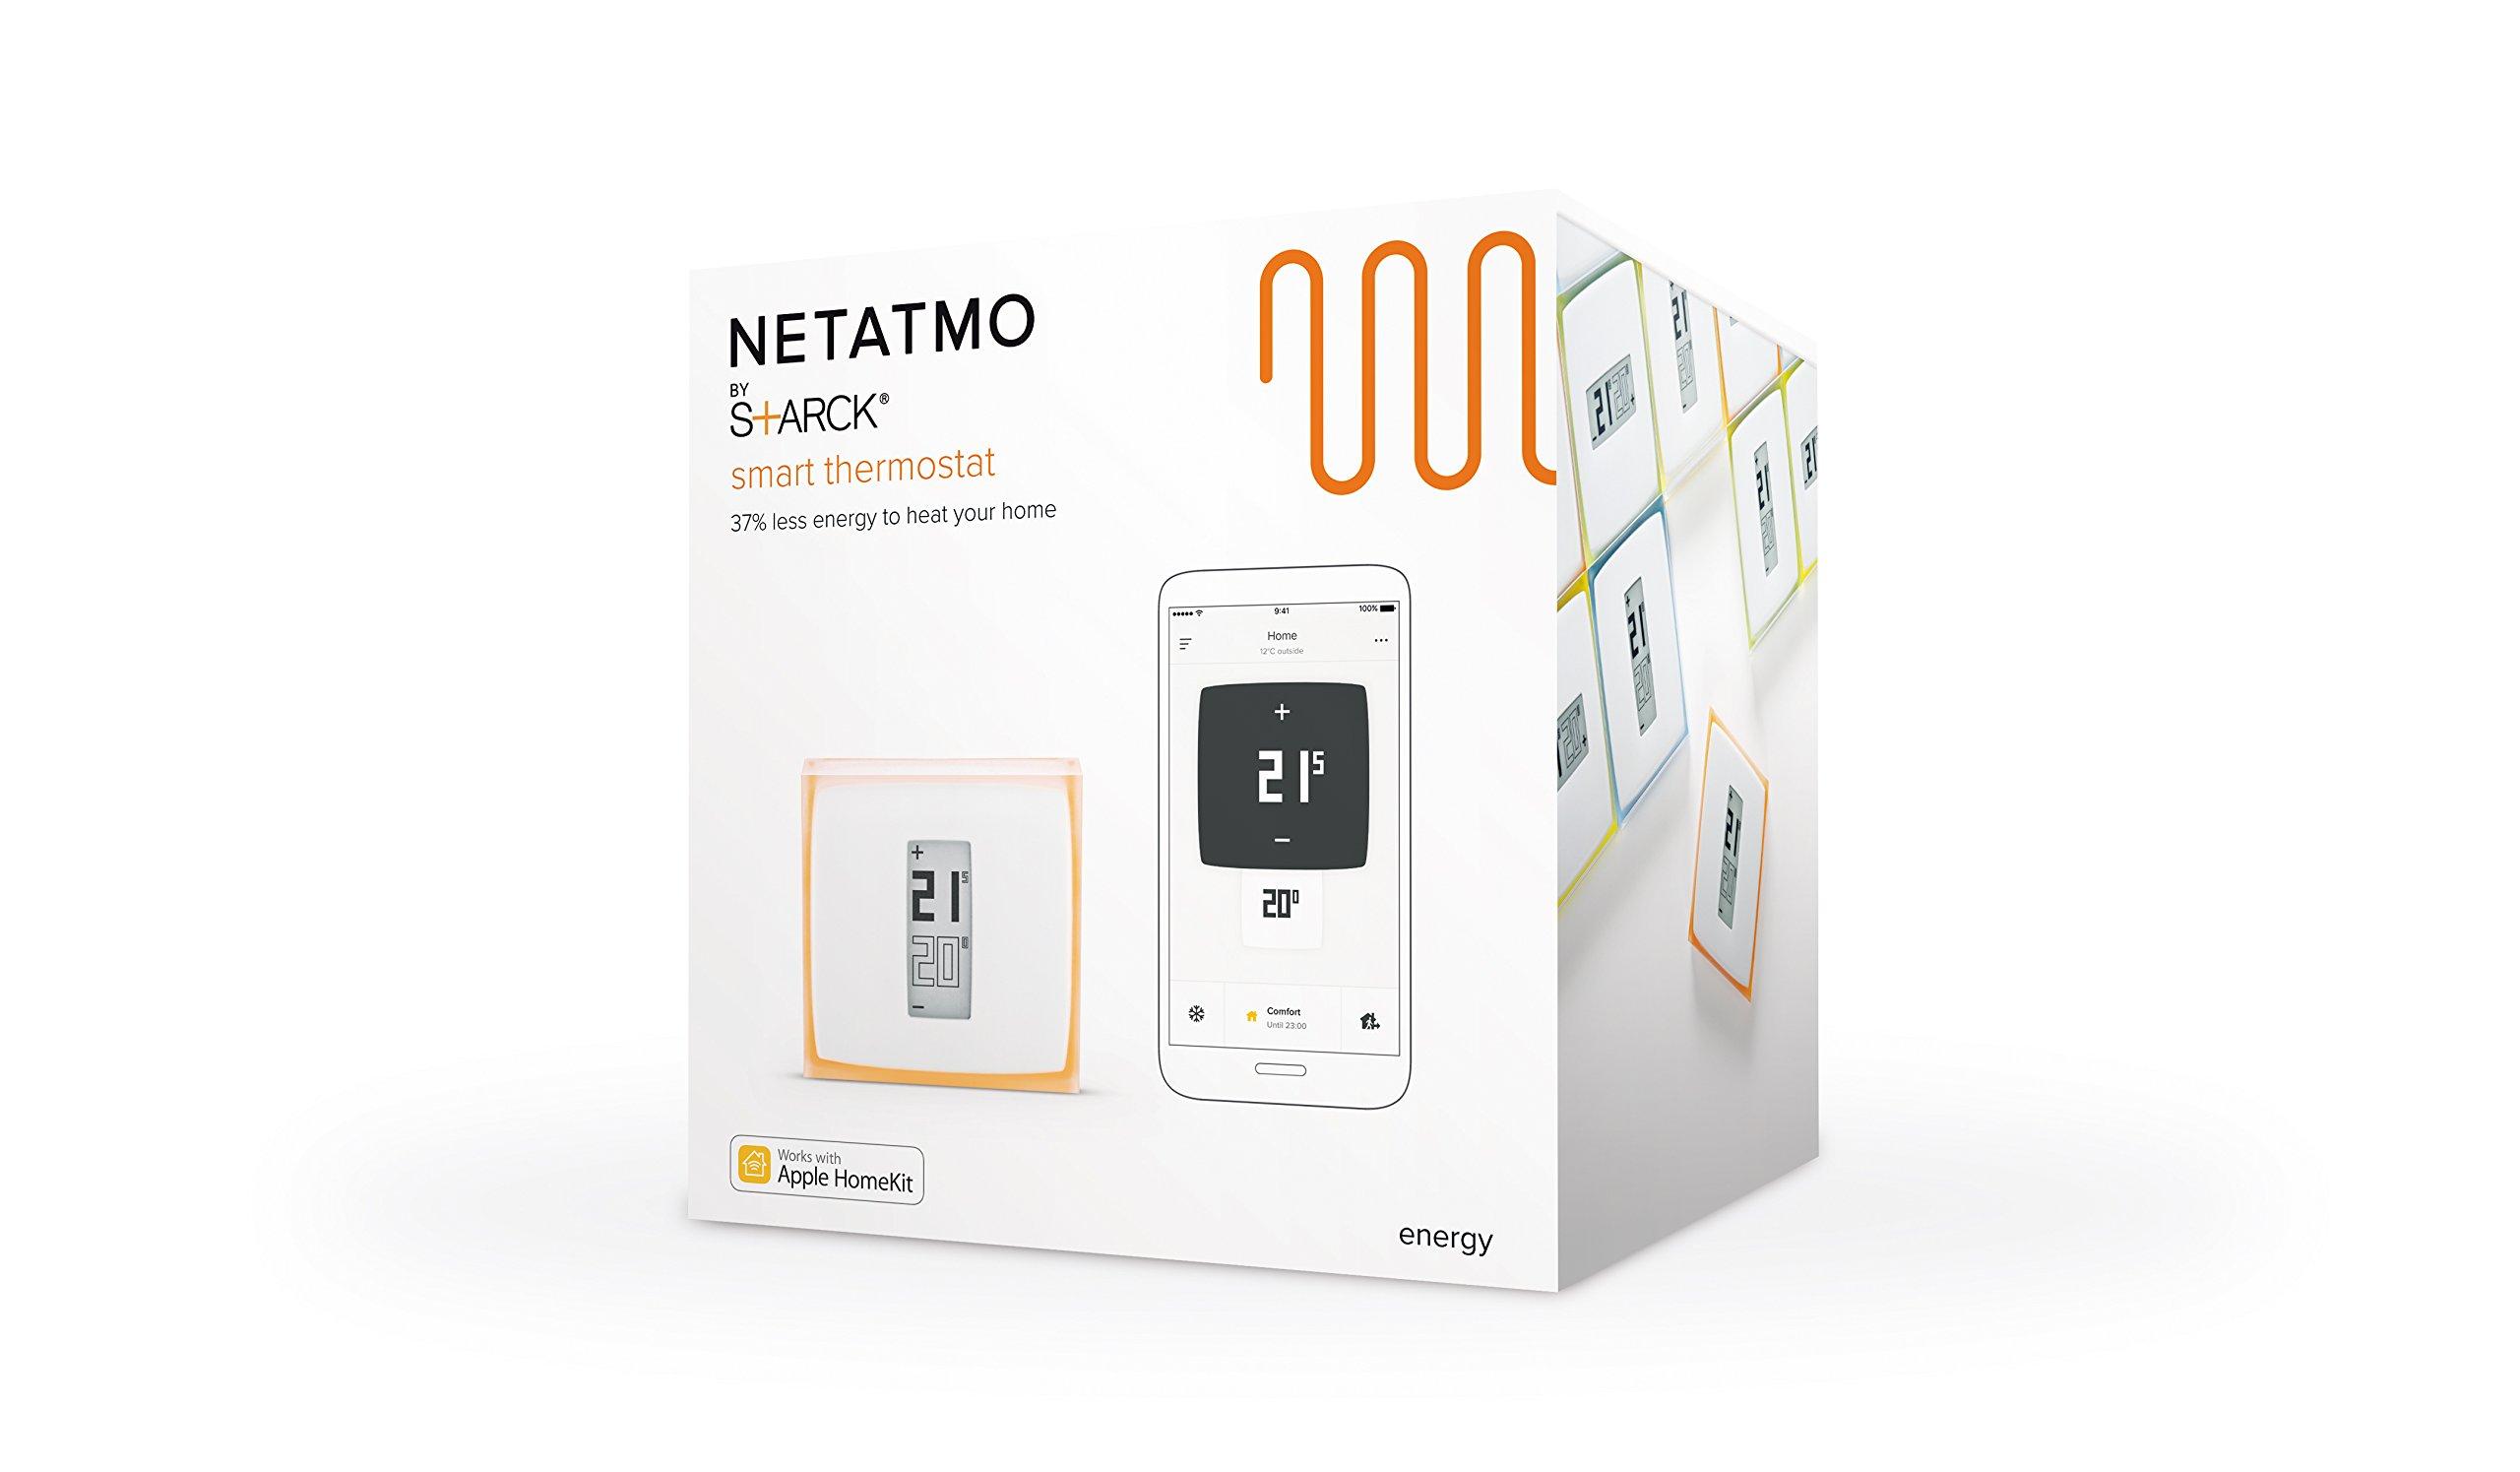 Netatmo INK010 Termostato Smart Controllabile da Smartphone